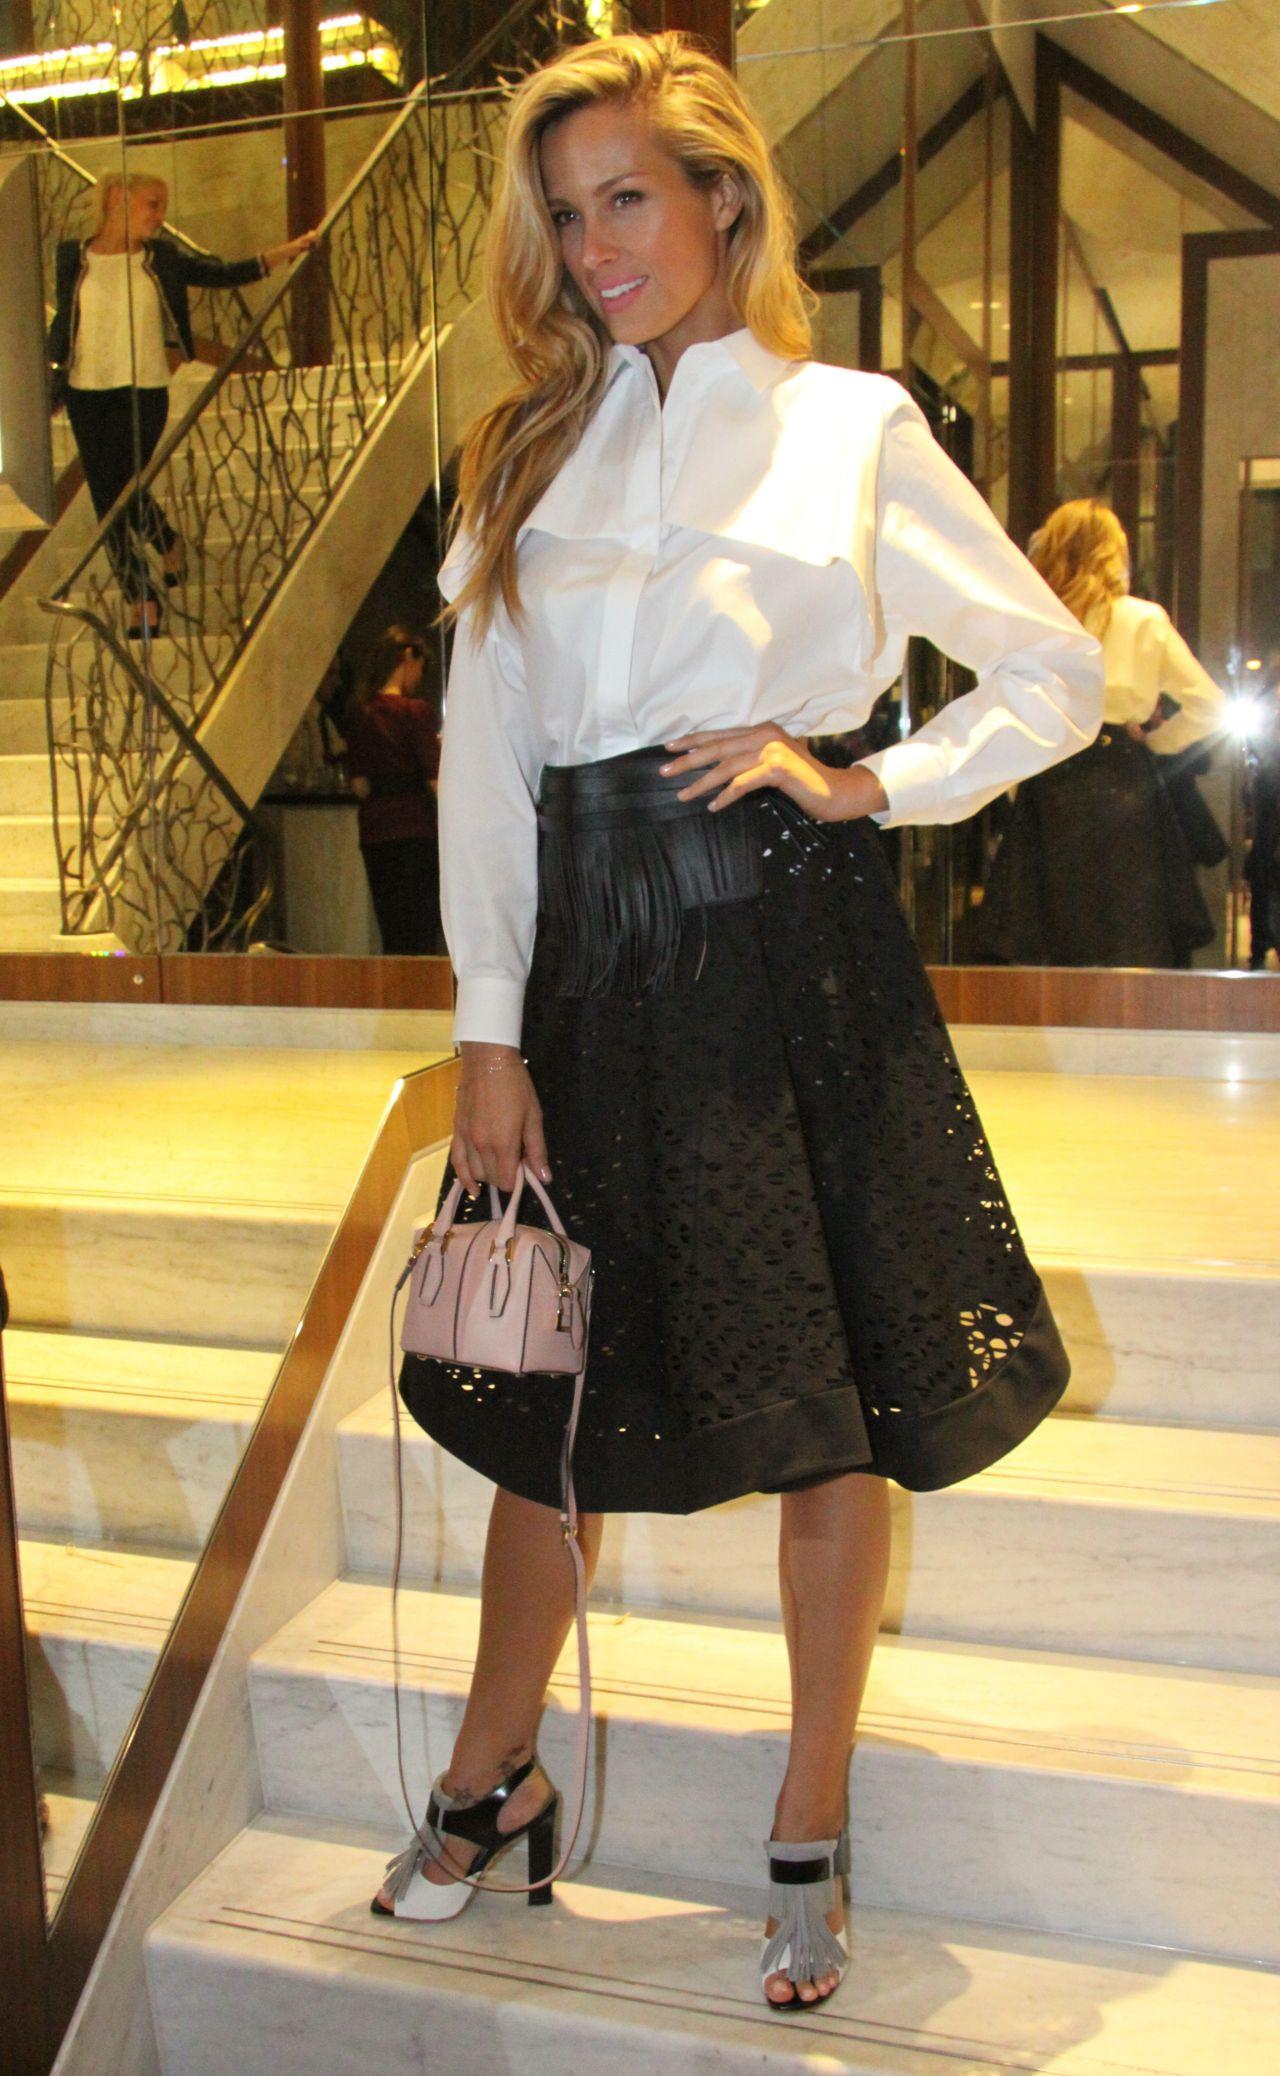 Petra Nemcova - Prague Fashion Night 2014 - March 2014 Fashion Show Dresses 2017